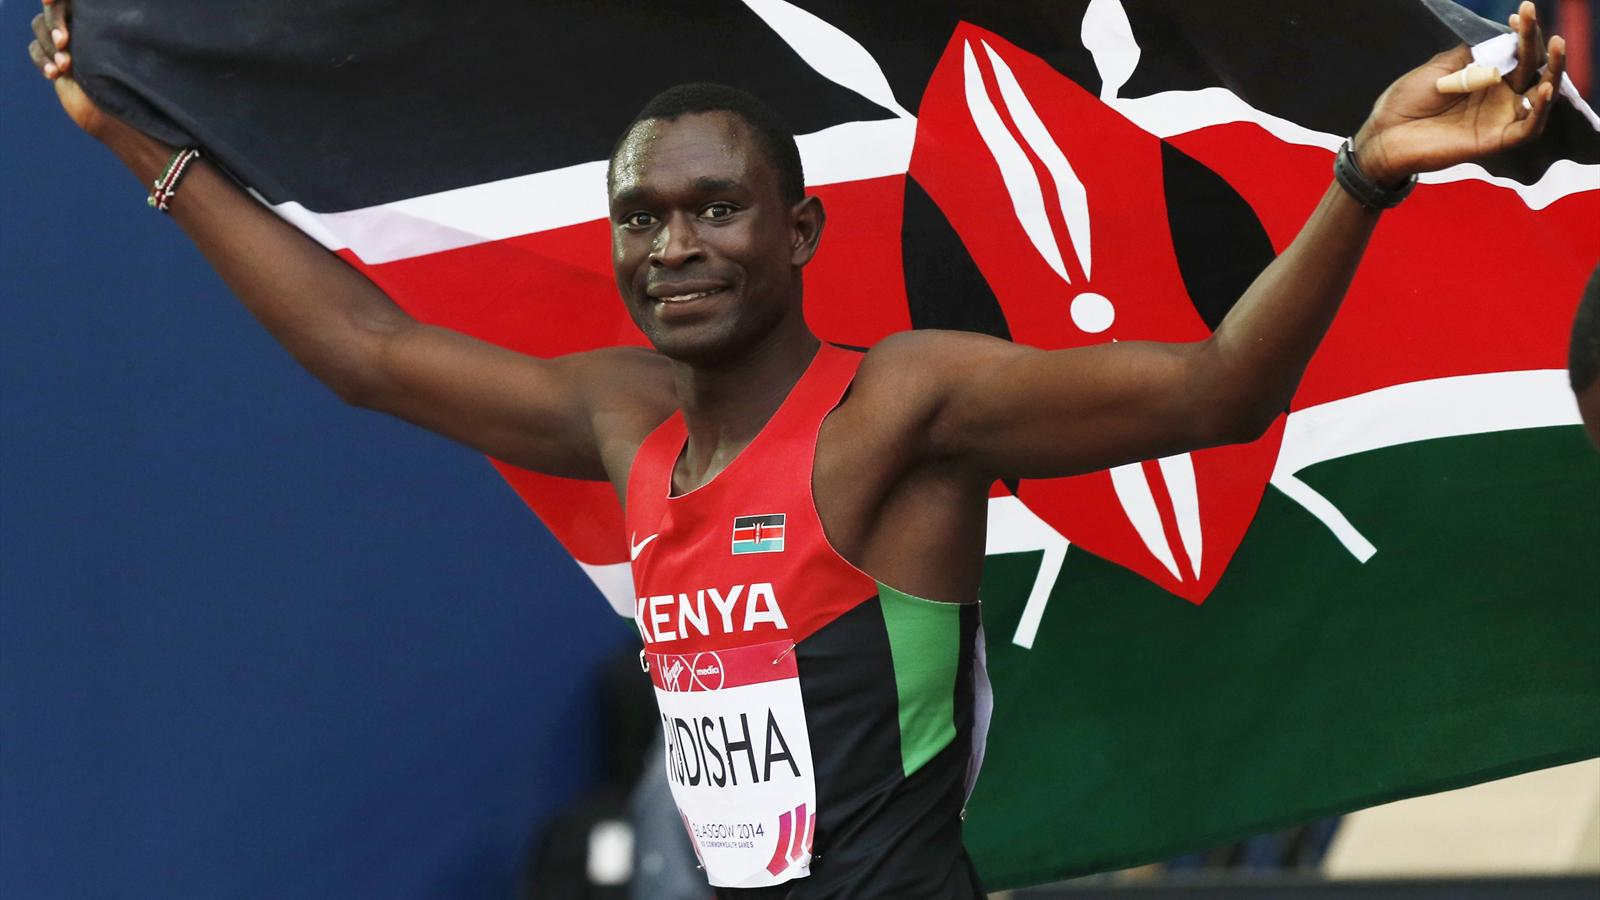 David Rudisha fears for Kenya's reputation after doping allegations - Athletics - Eurosport